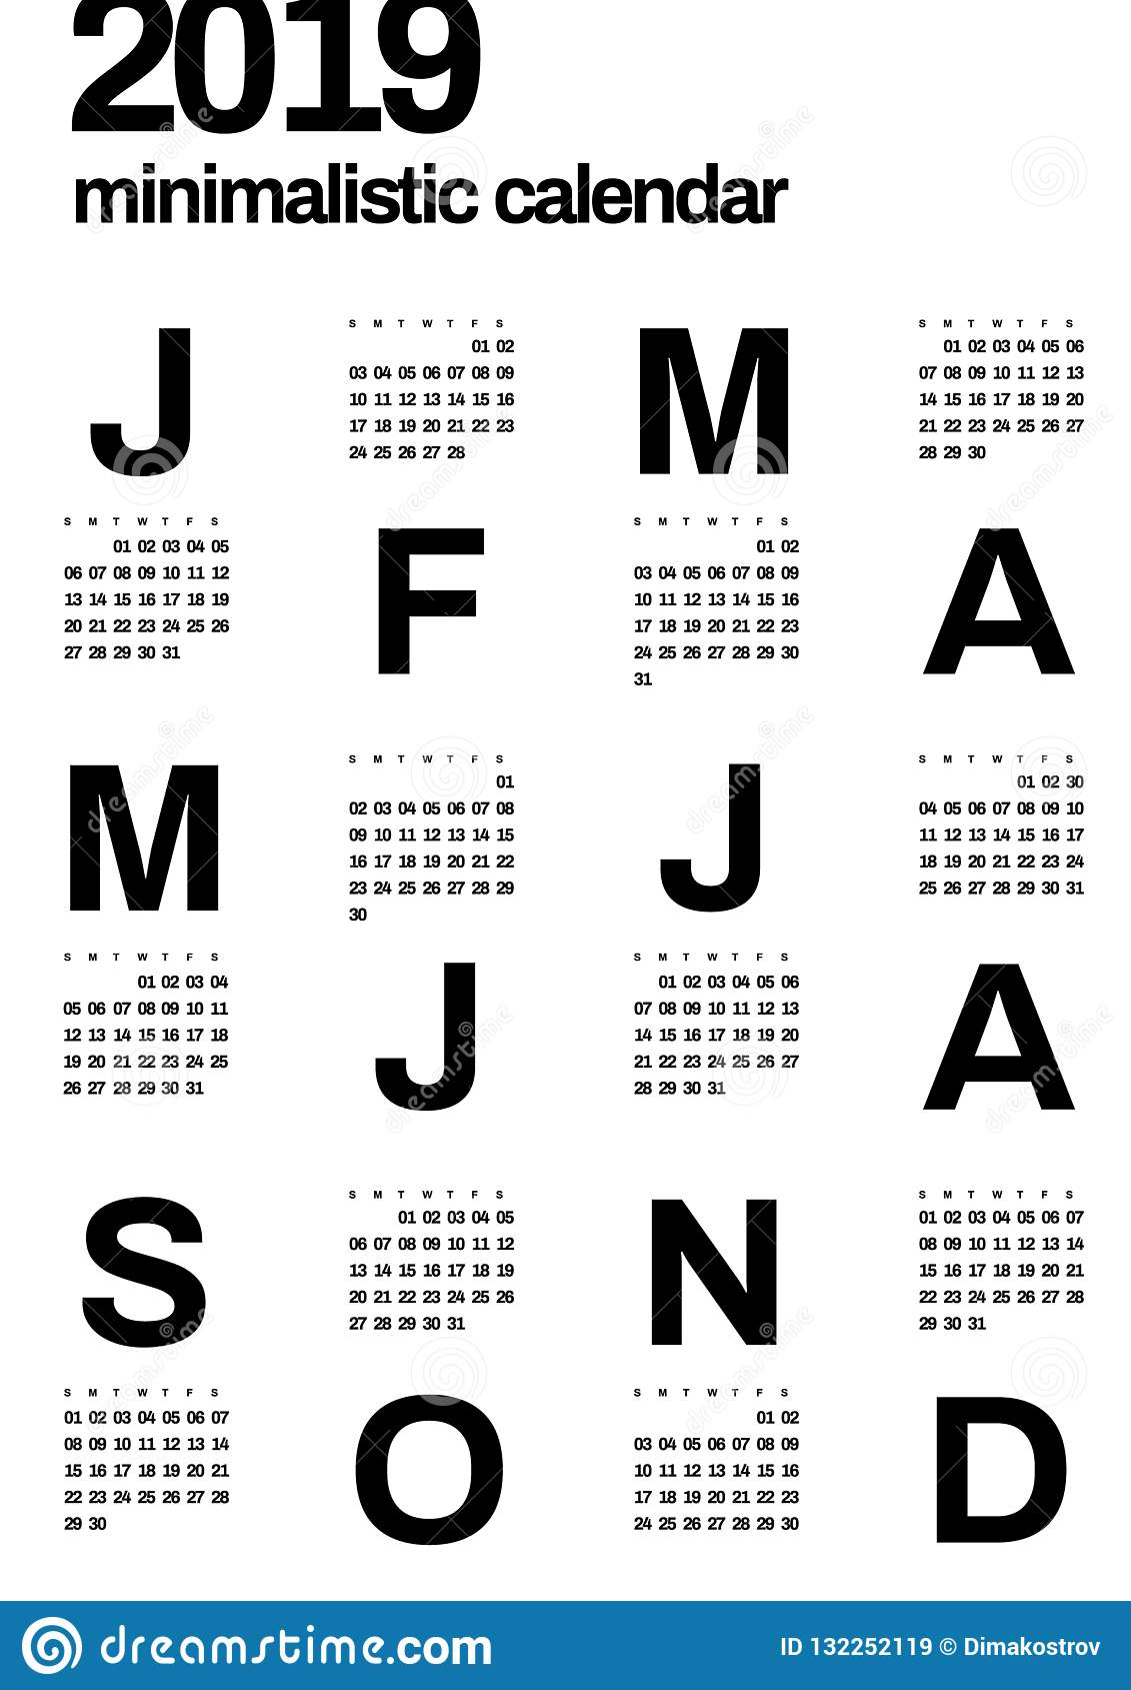 Minimalistic projekta kalendarz dla 2019 rok jeden kolor